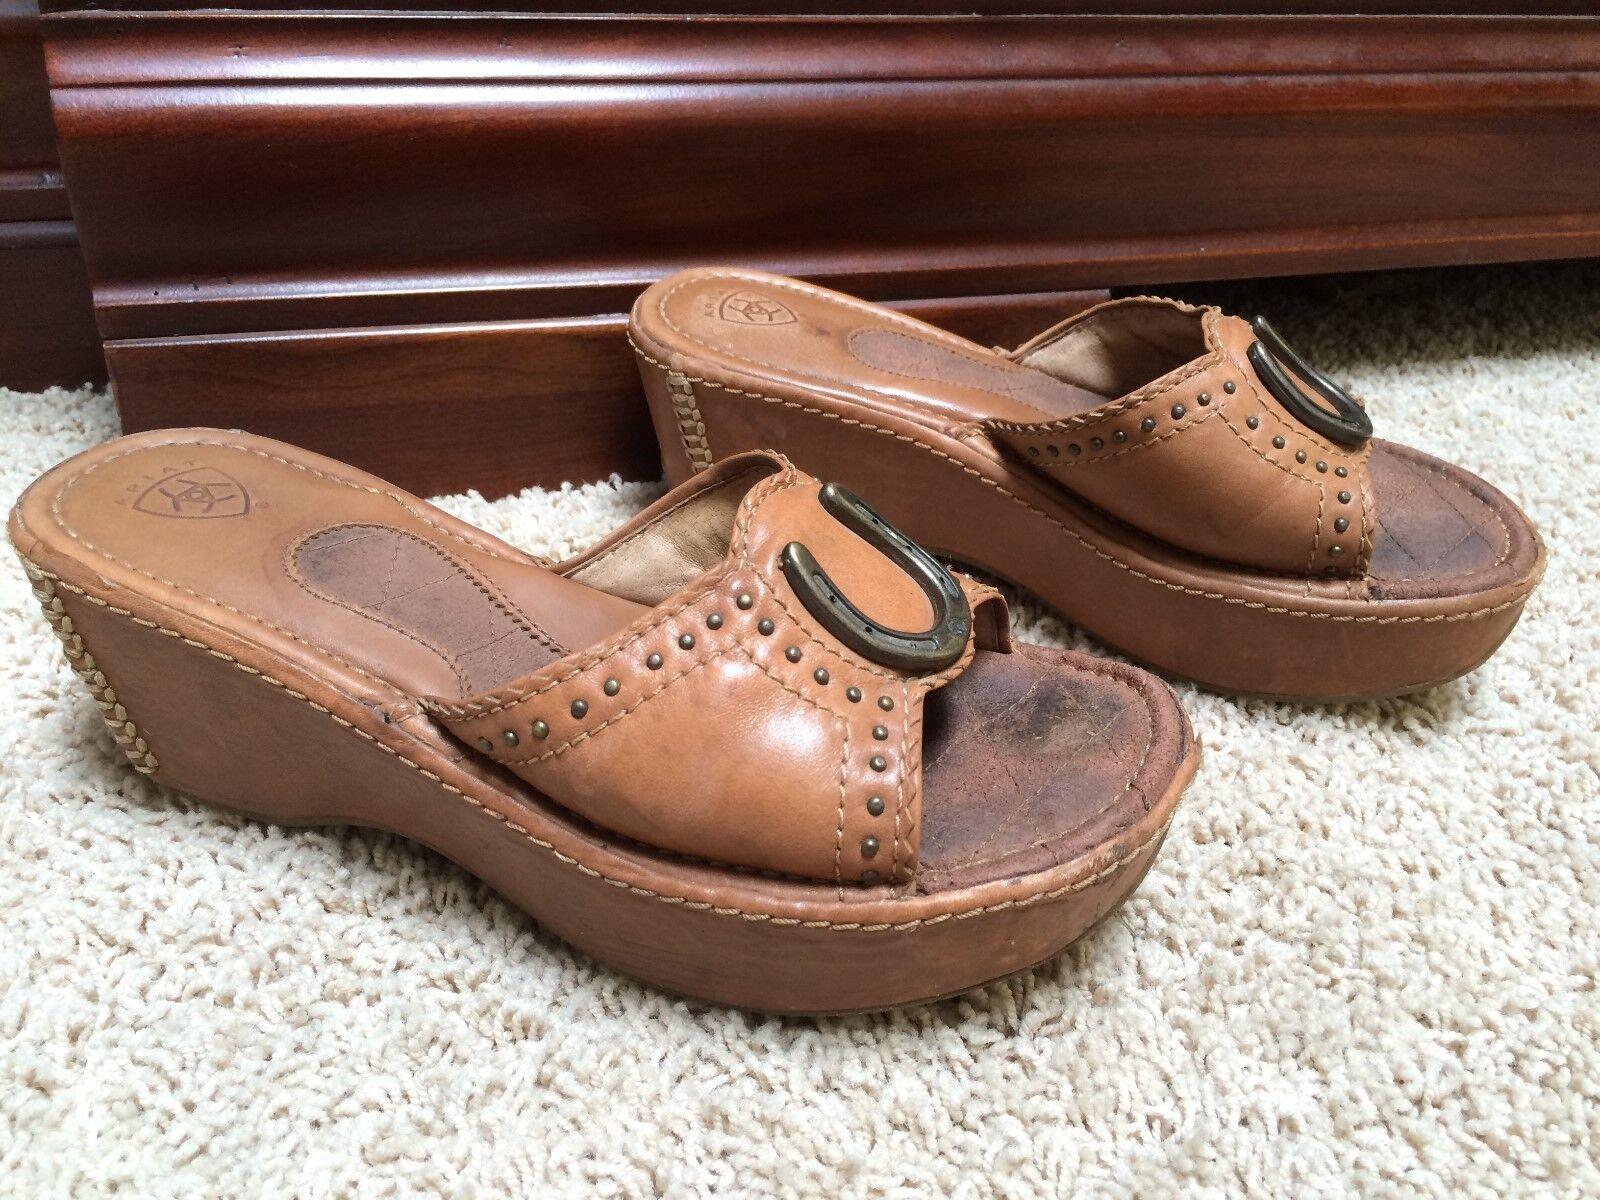 ARIAT Casey Wedge Shoes Horseshoe 21670 Emblem Woman's Size 6.5B 21670 Horseshoe Boots 0548d8